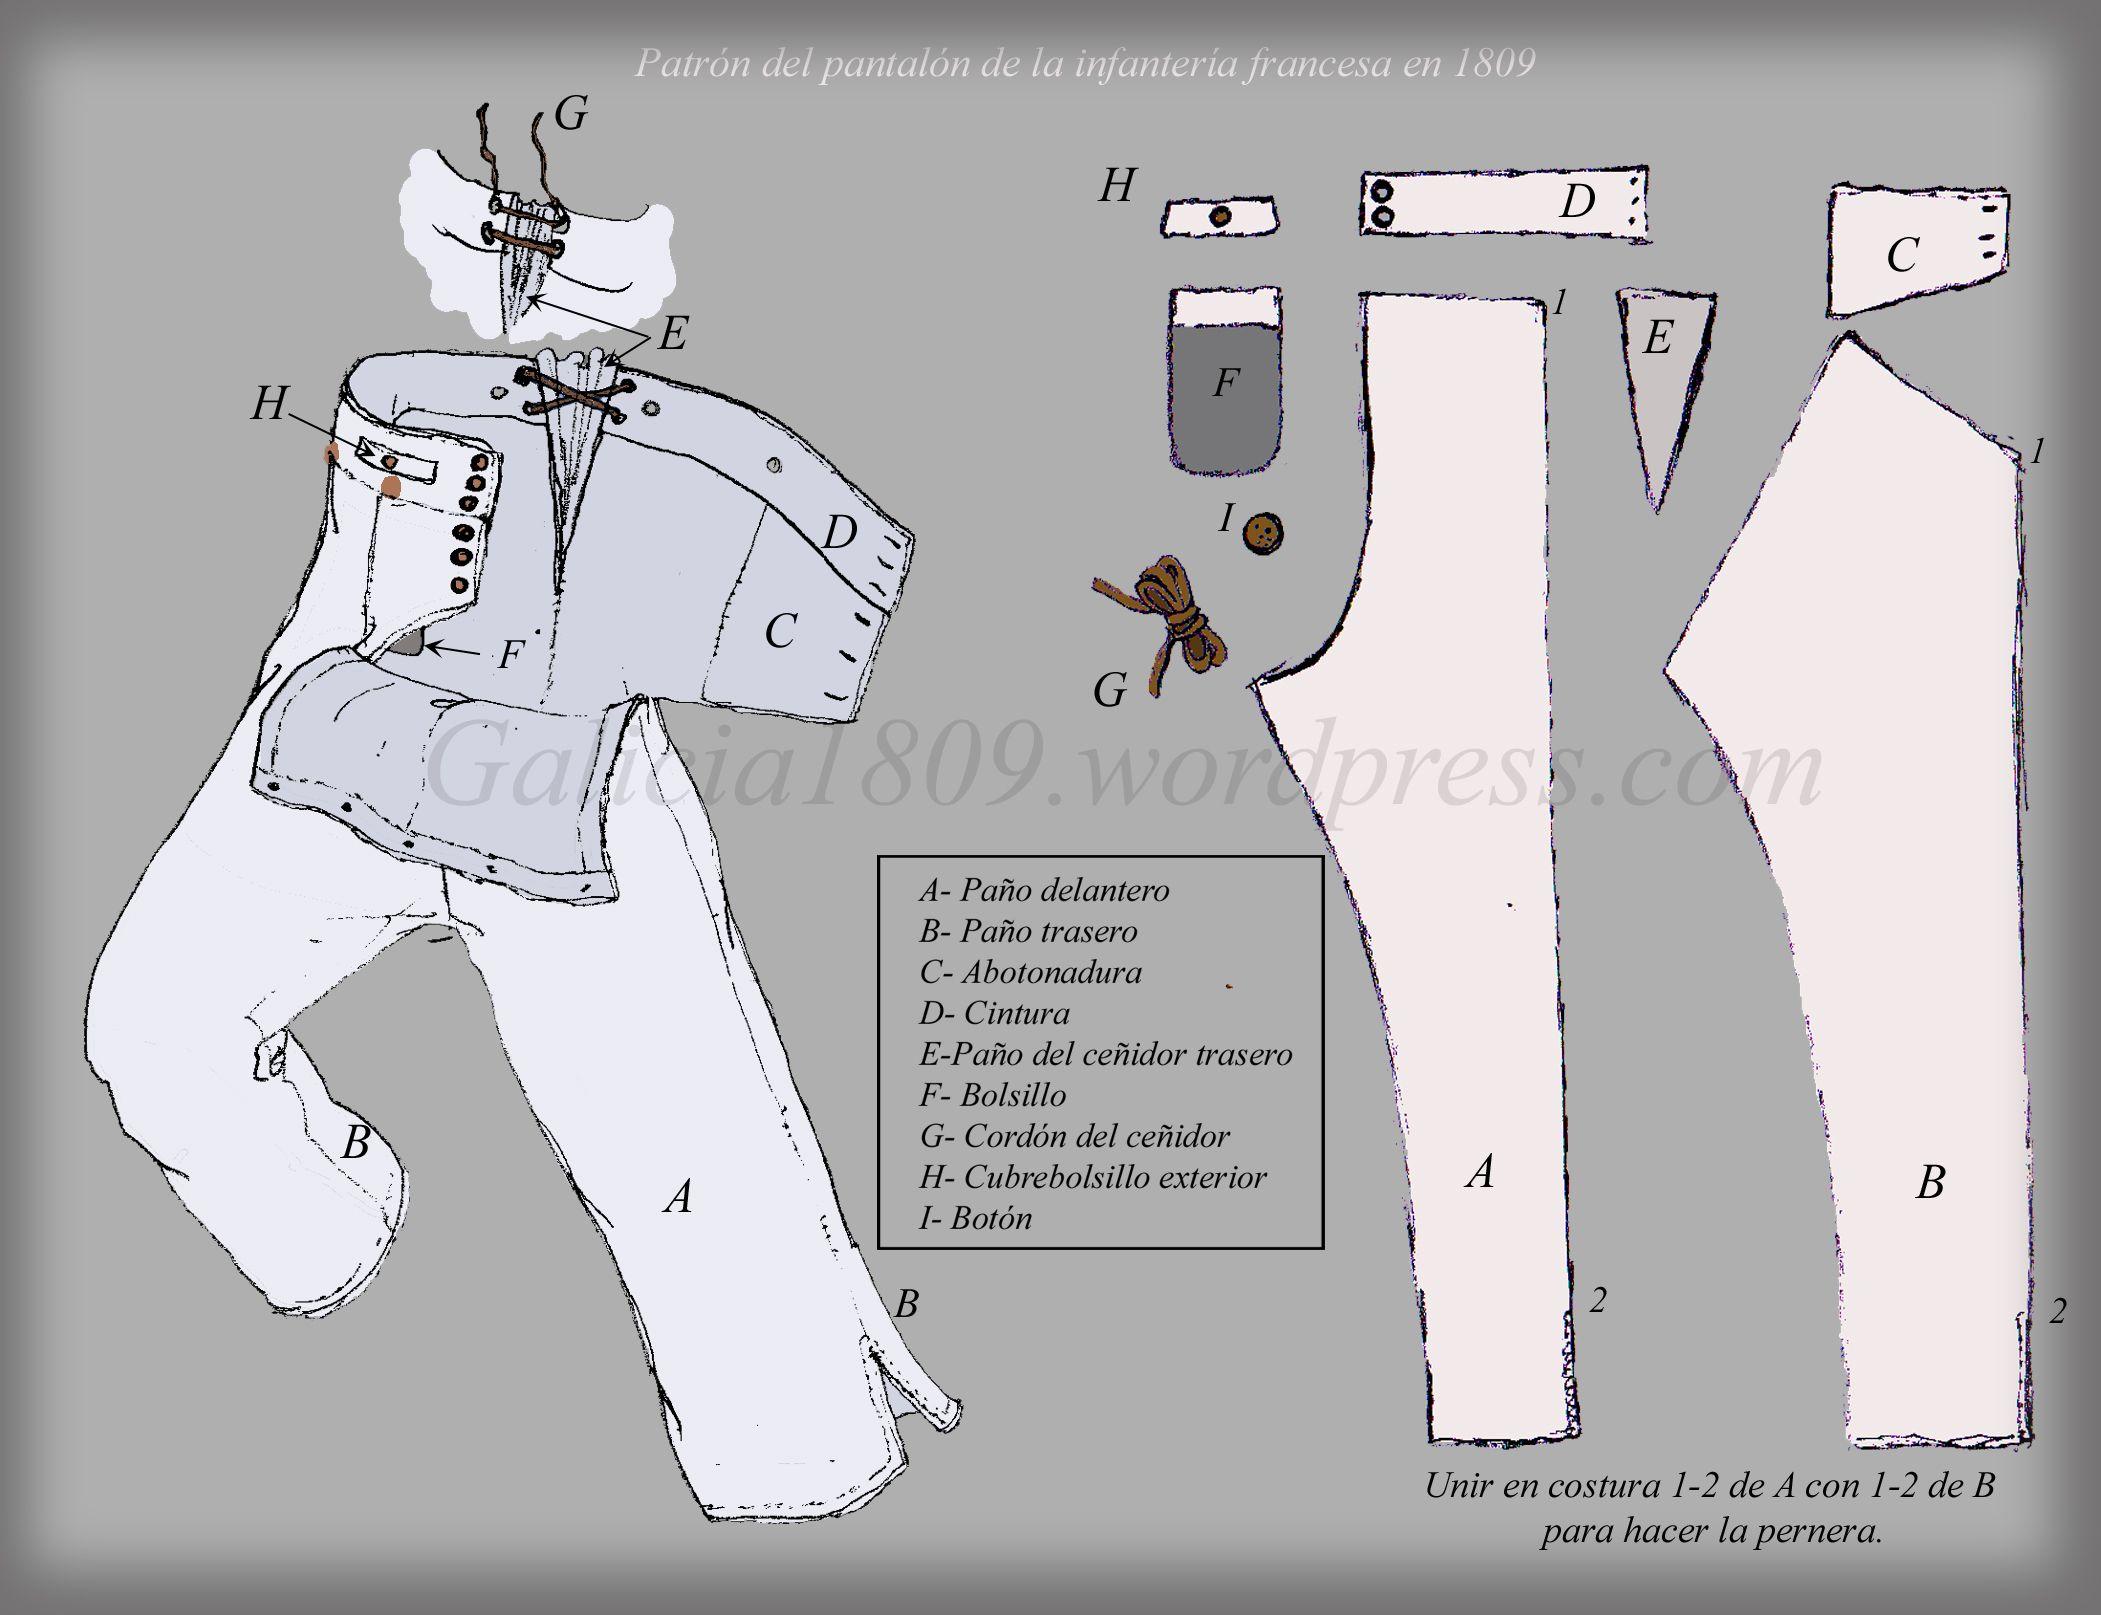 patrc3b3n-pantalc3b3n-infanteria-francesa-galicia1809-wordpress-com ...